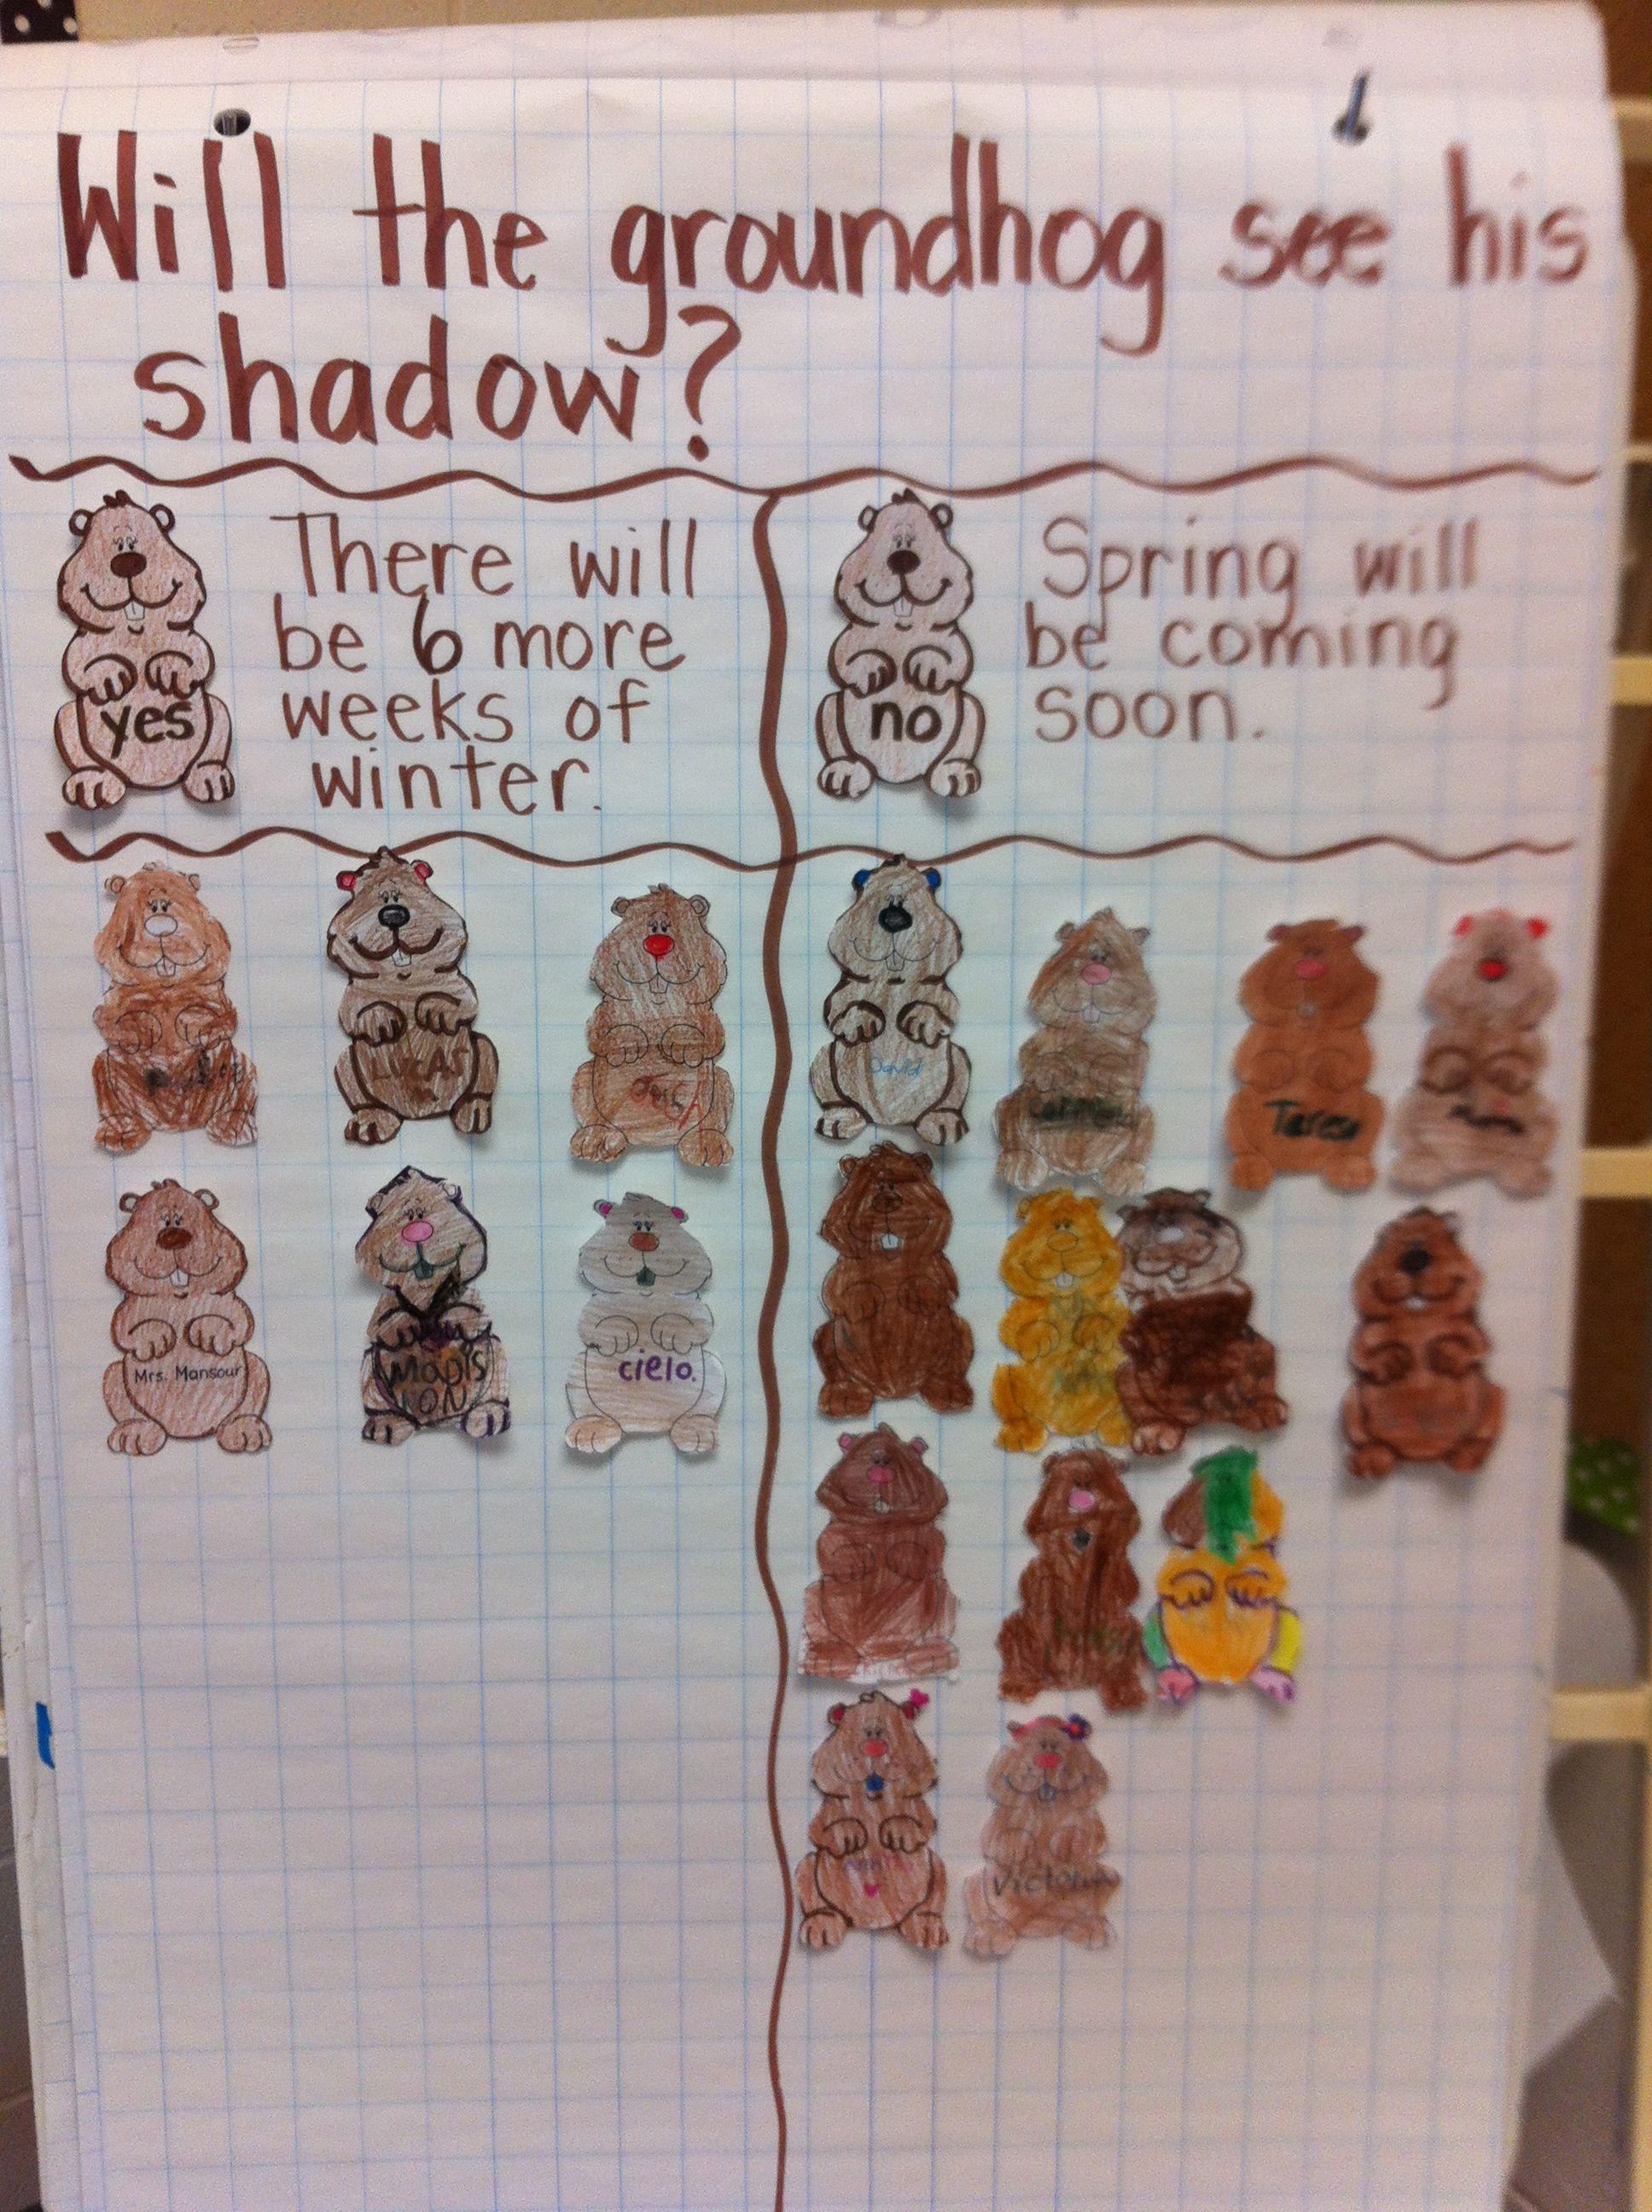 Groundhog Day Prediction Chart